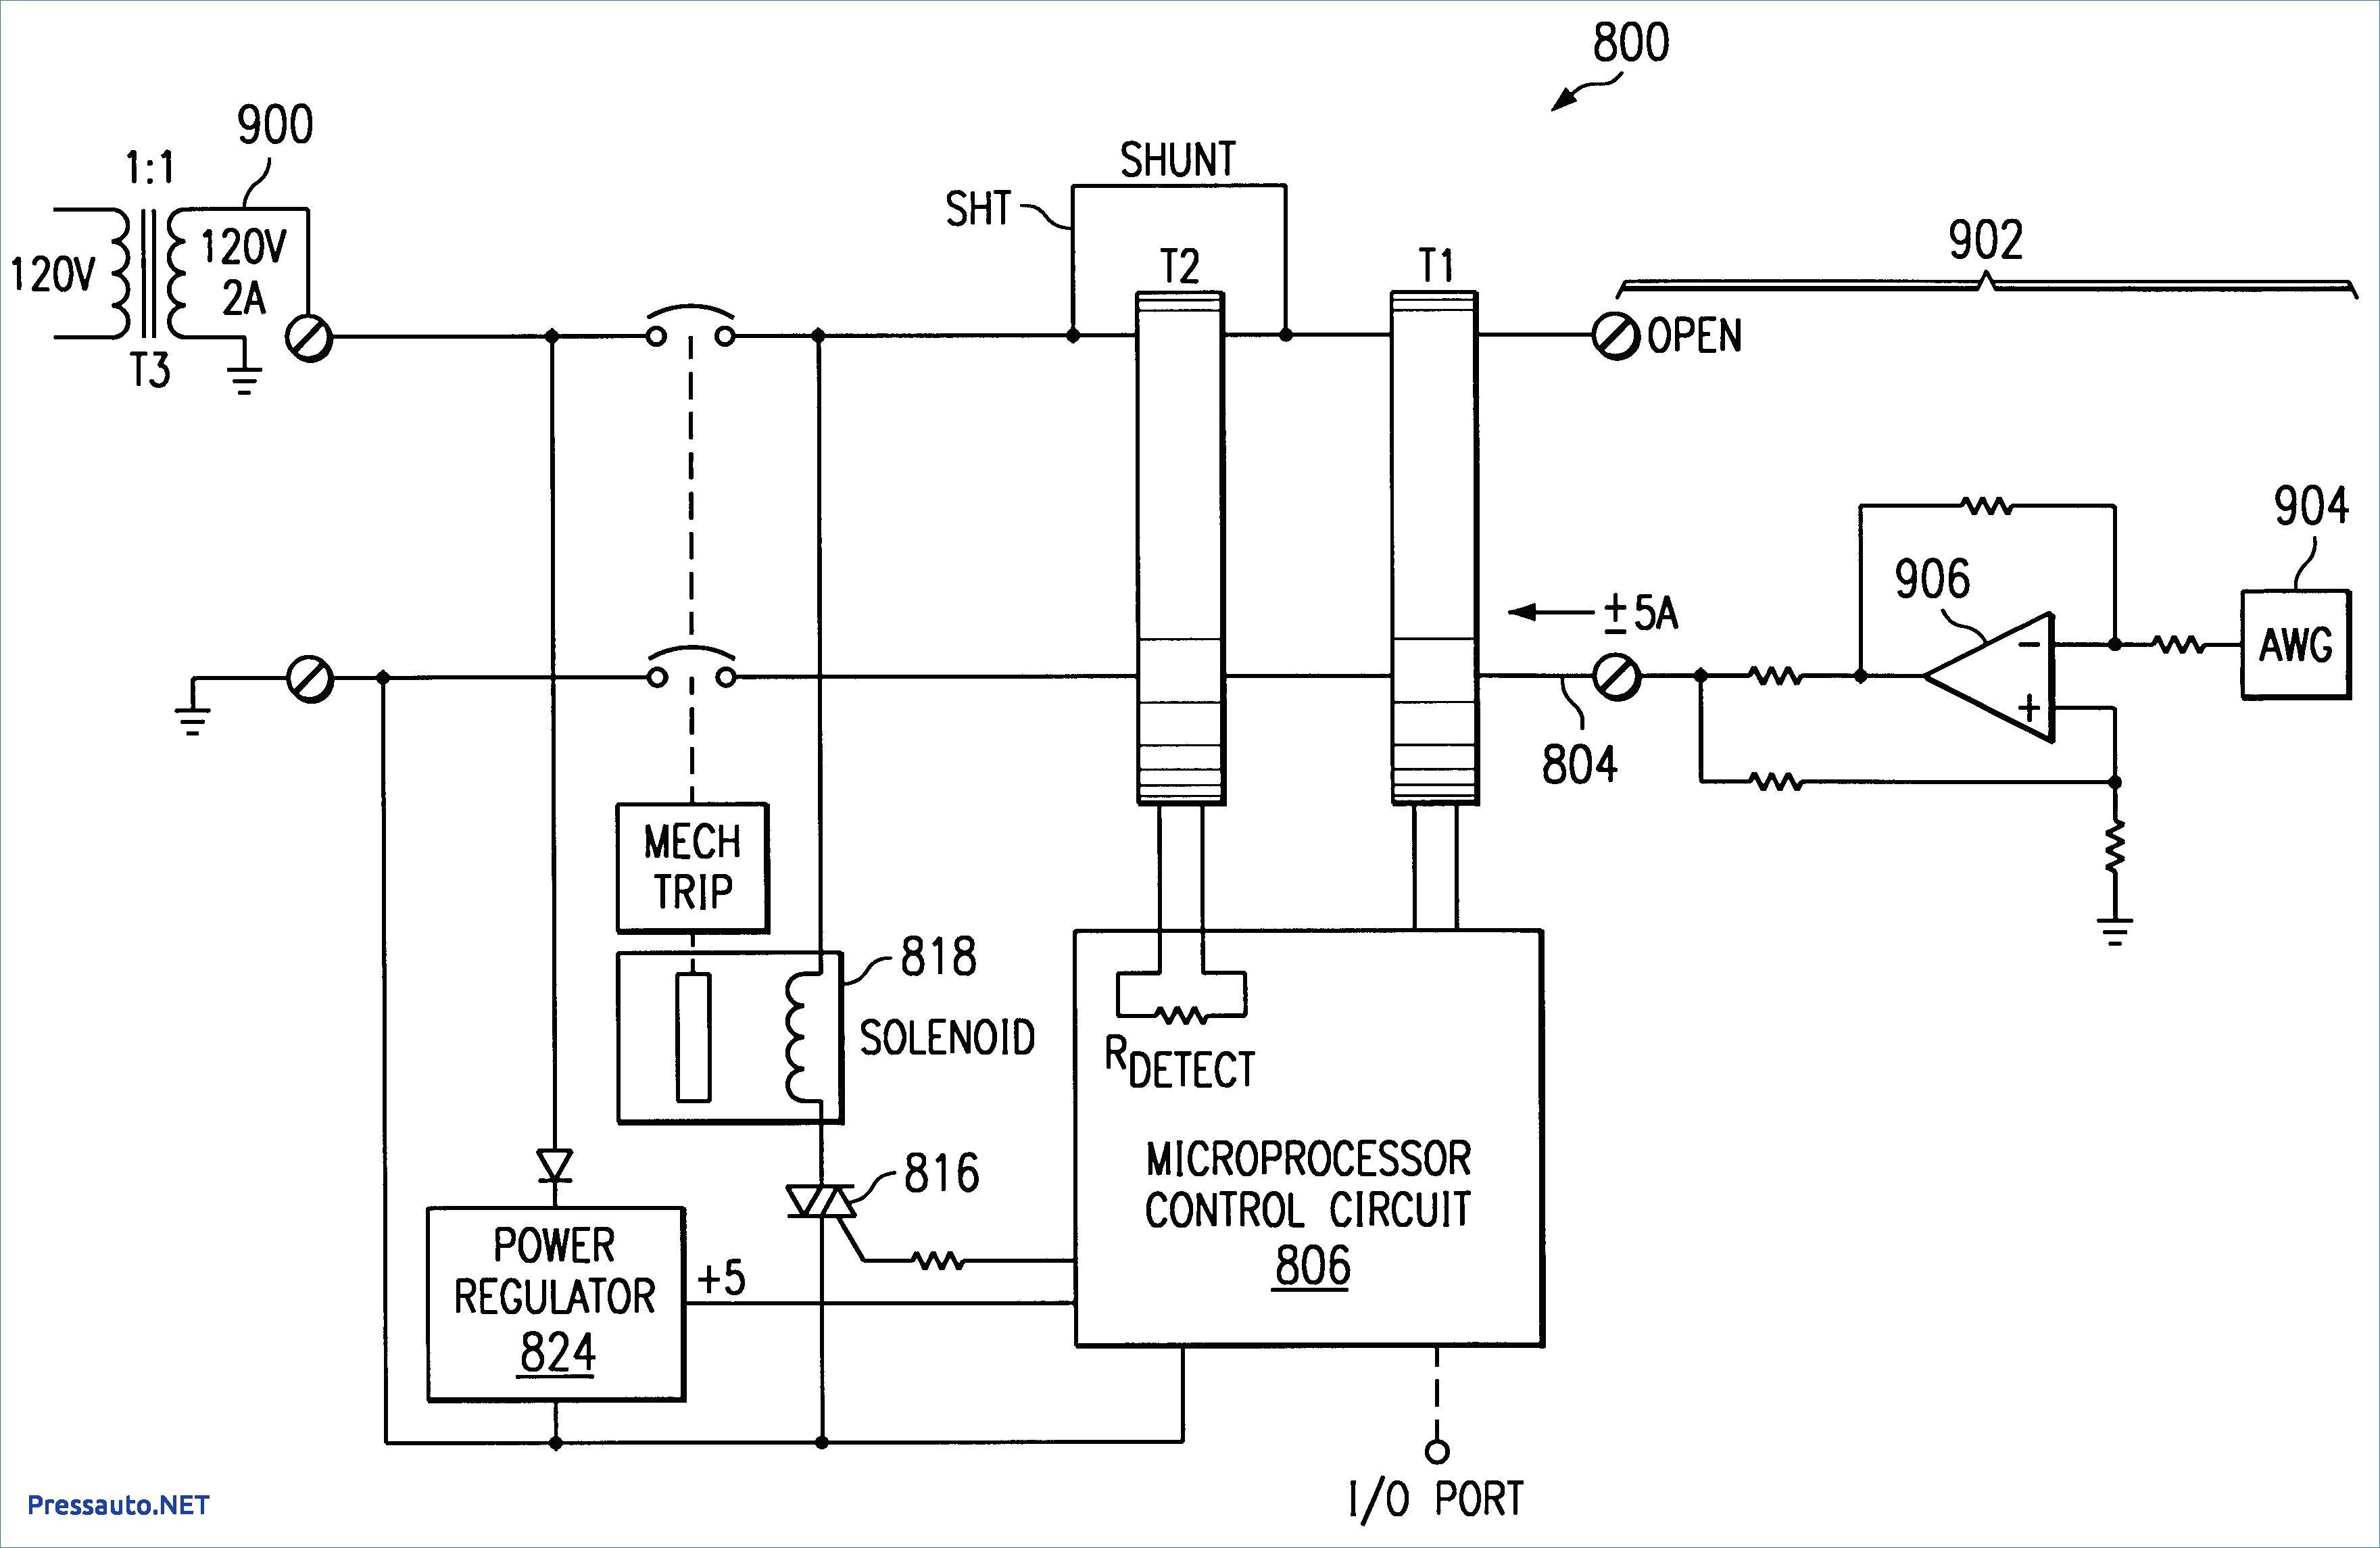 Square D Ground Fault Breaker Wiring Diagram | Wiring Library - 2 Pole Gfci Breaker Wiring Diagram